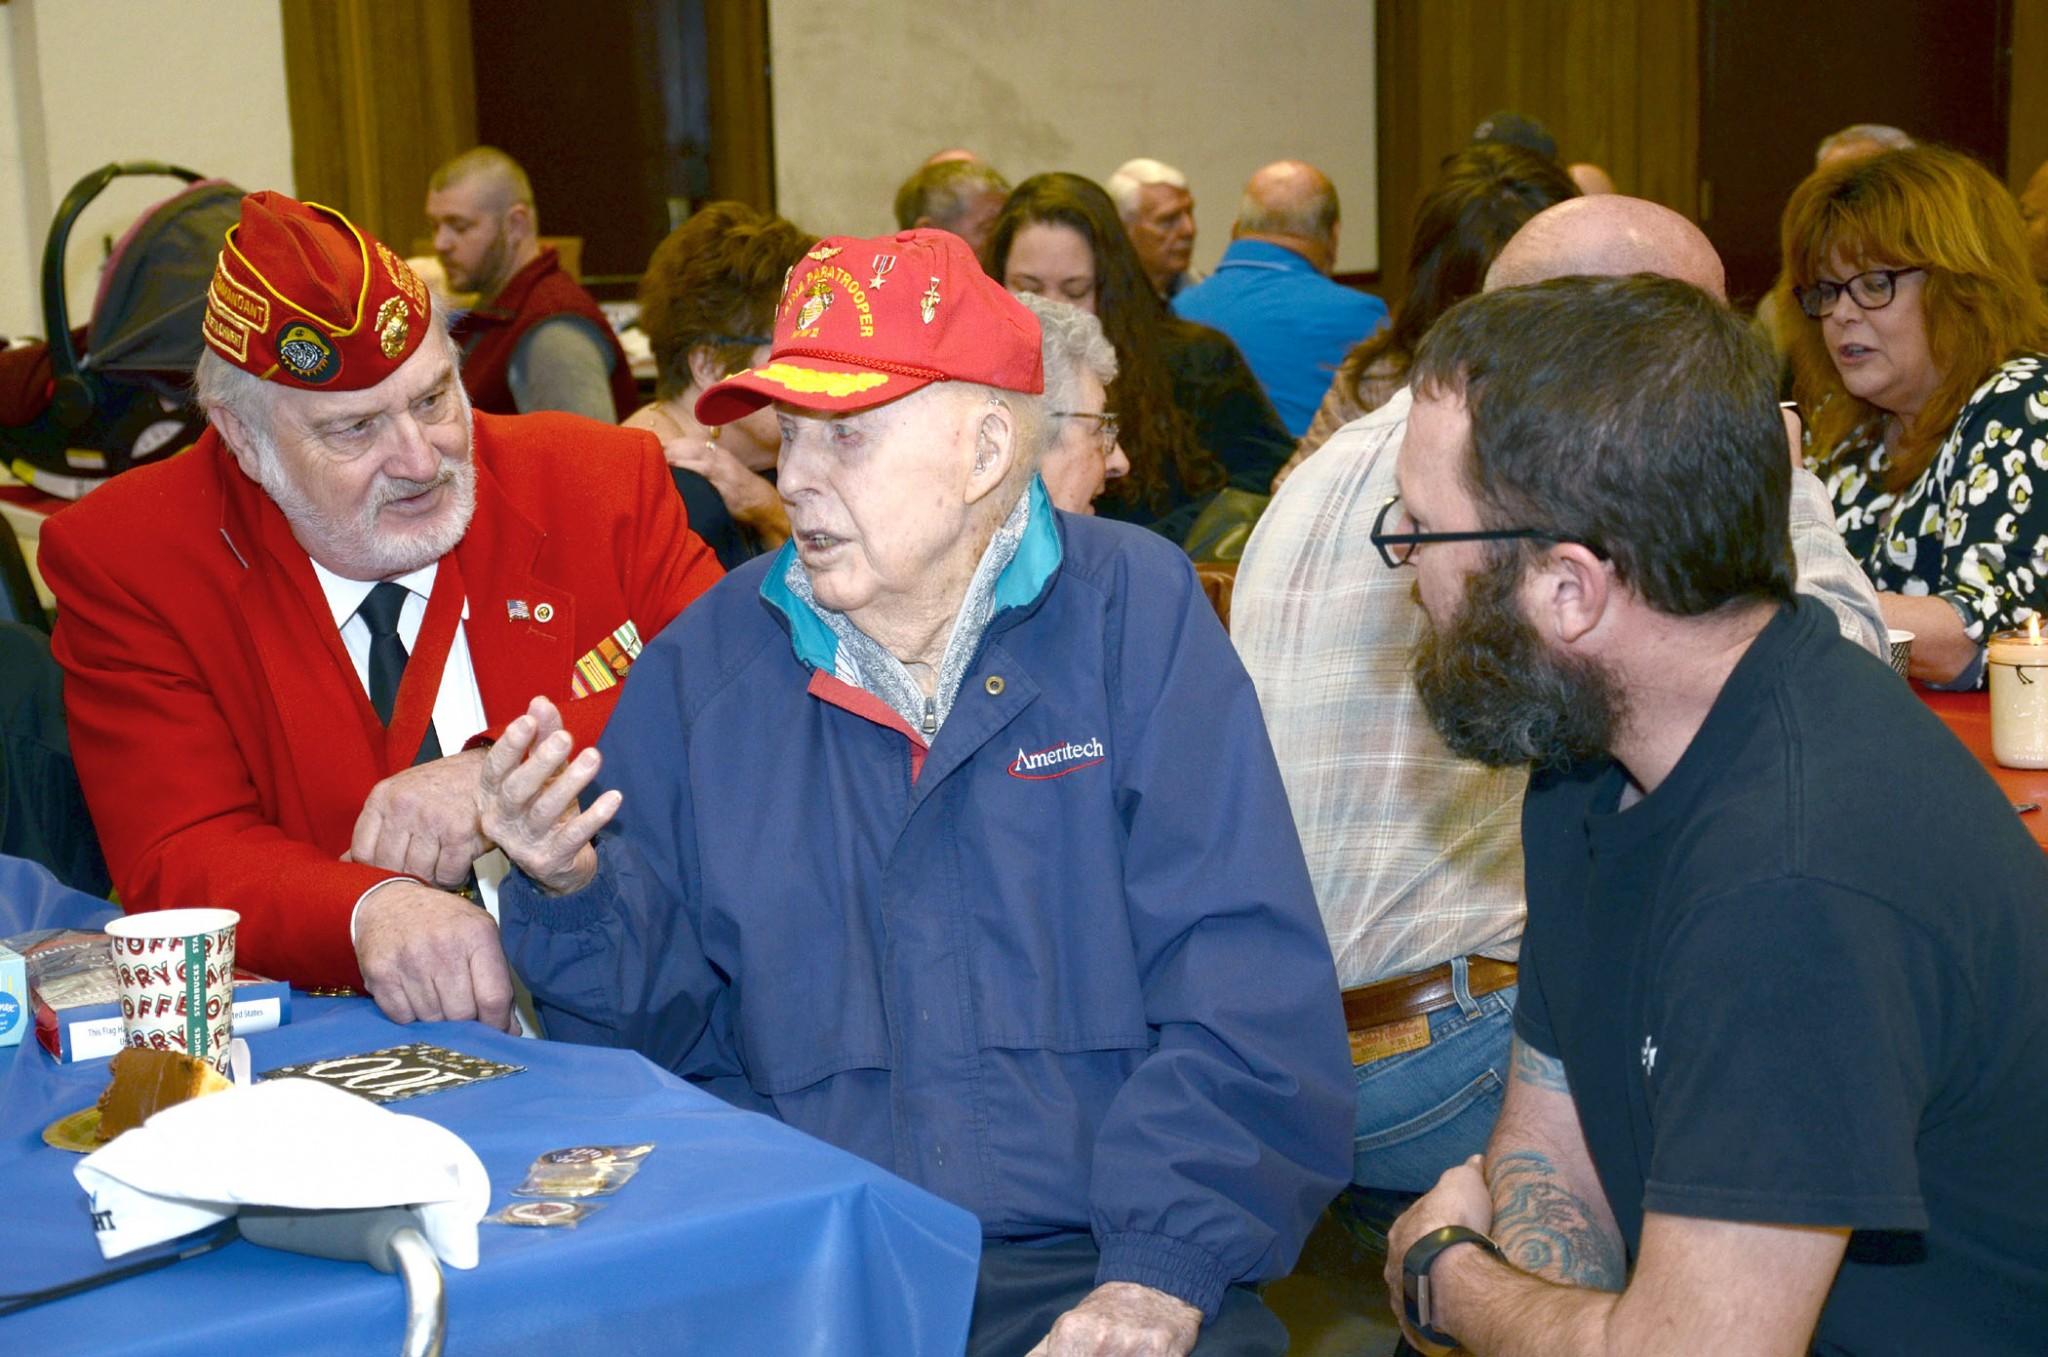 Tom Siefke talks with Bob Baker, left, commander of Marine Corp League Lou Diamond Detachment 272 and James Jacob, 1st sergeant, retired, 1st Battalion, 24th Marines. (Press photo by Ken Grosjean)